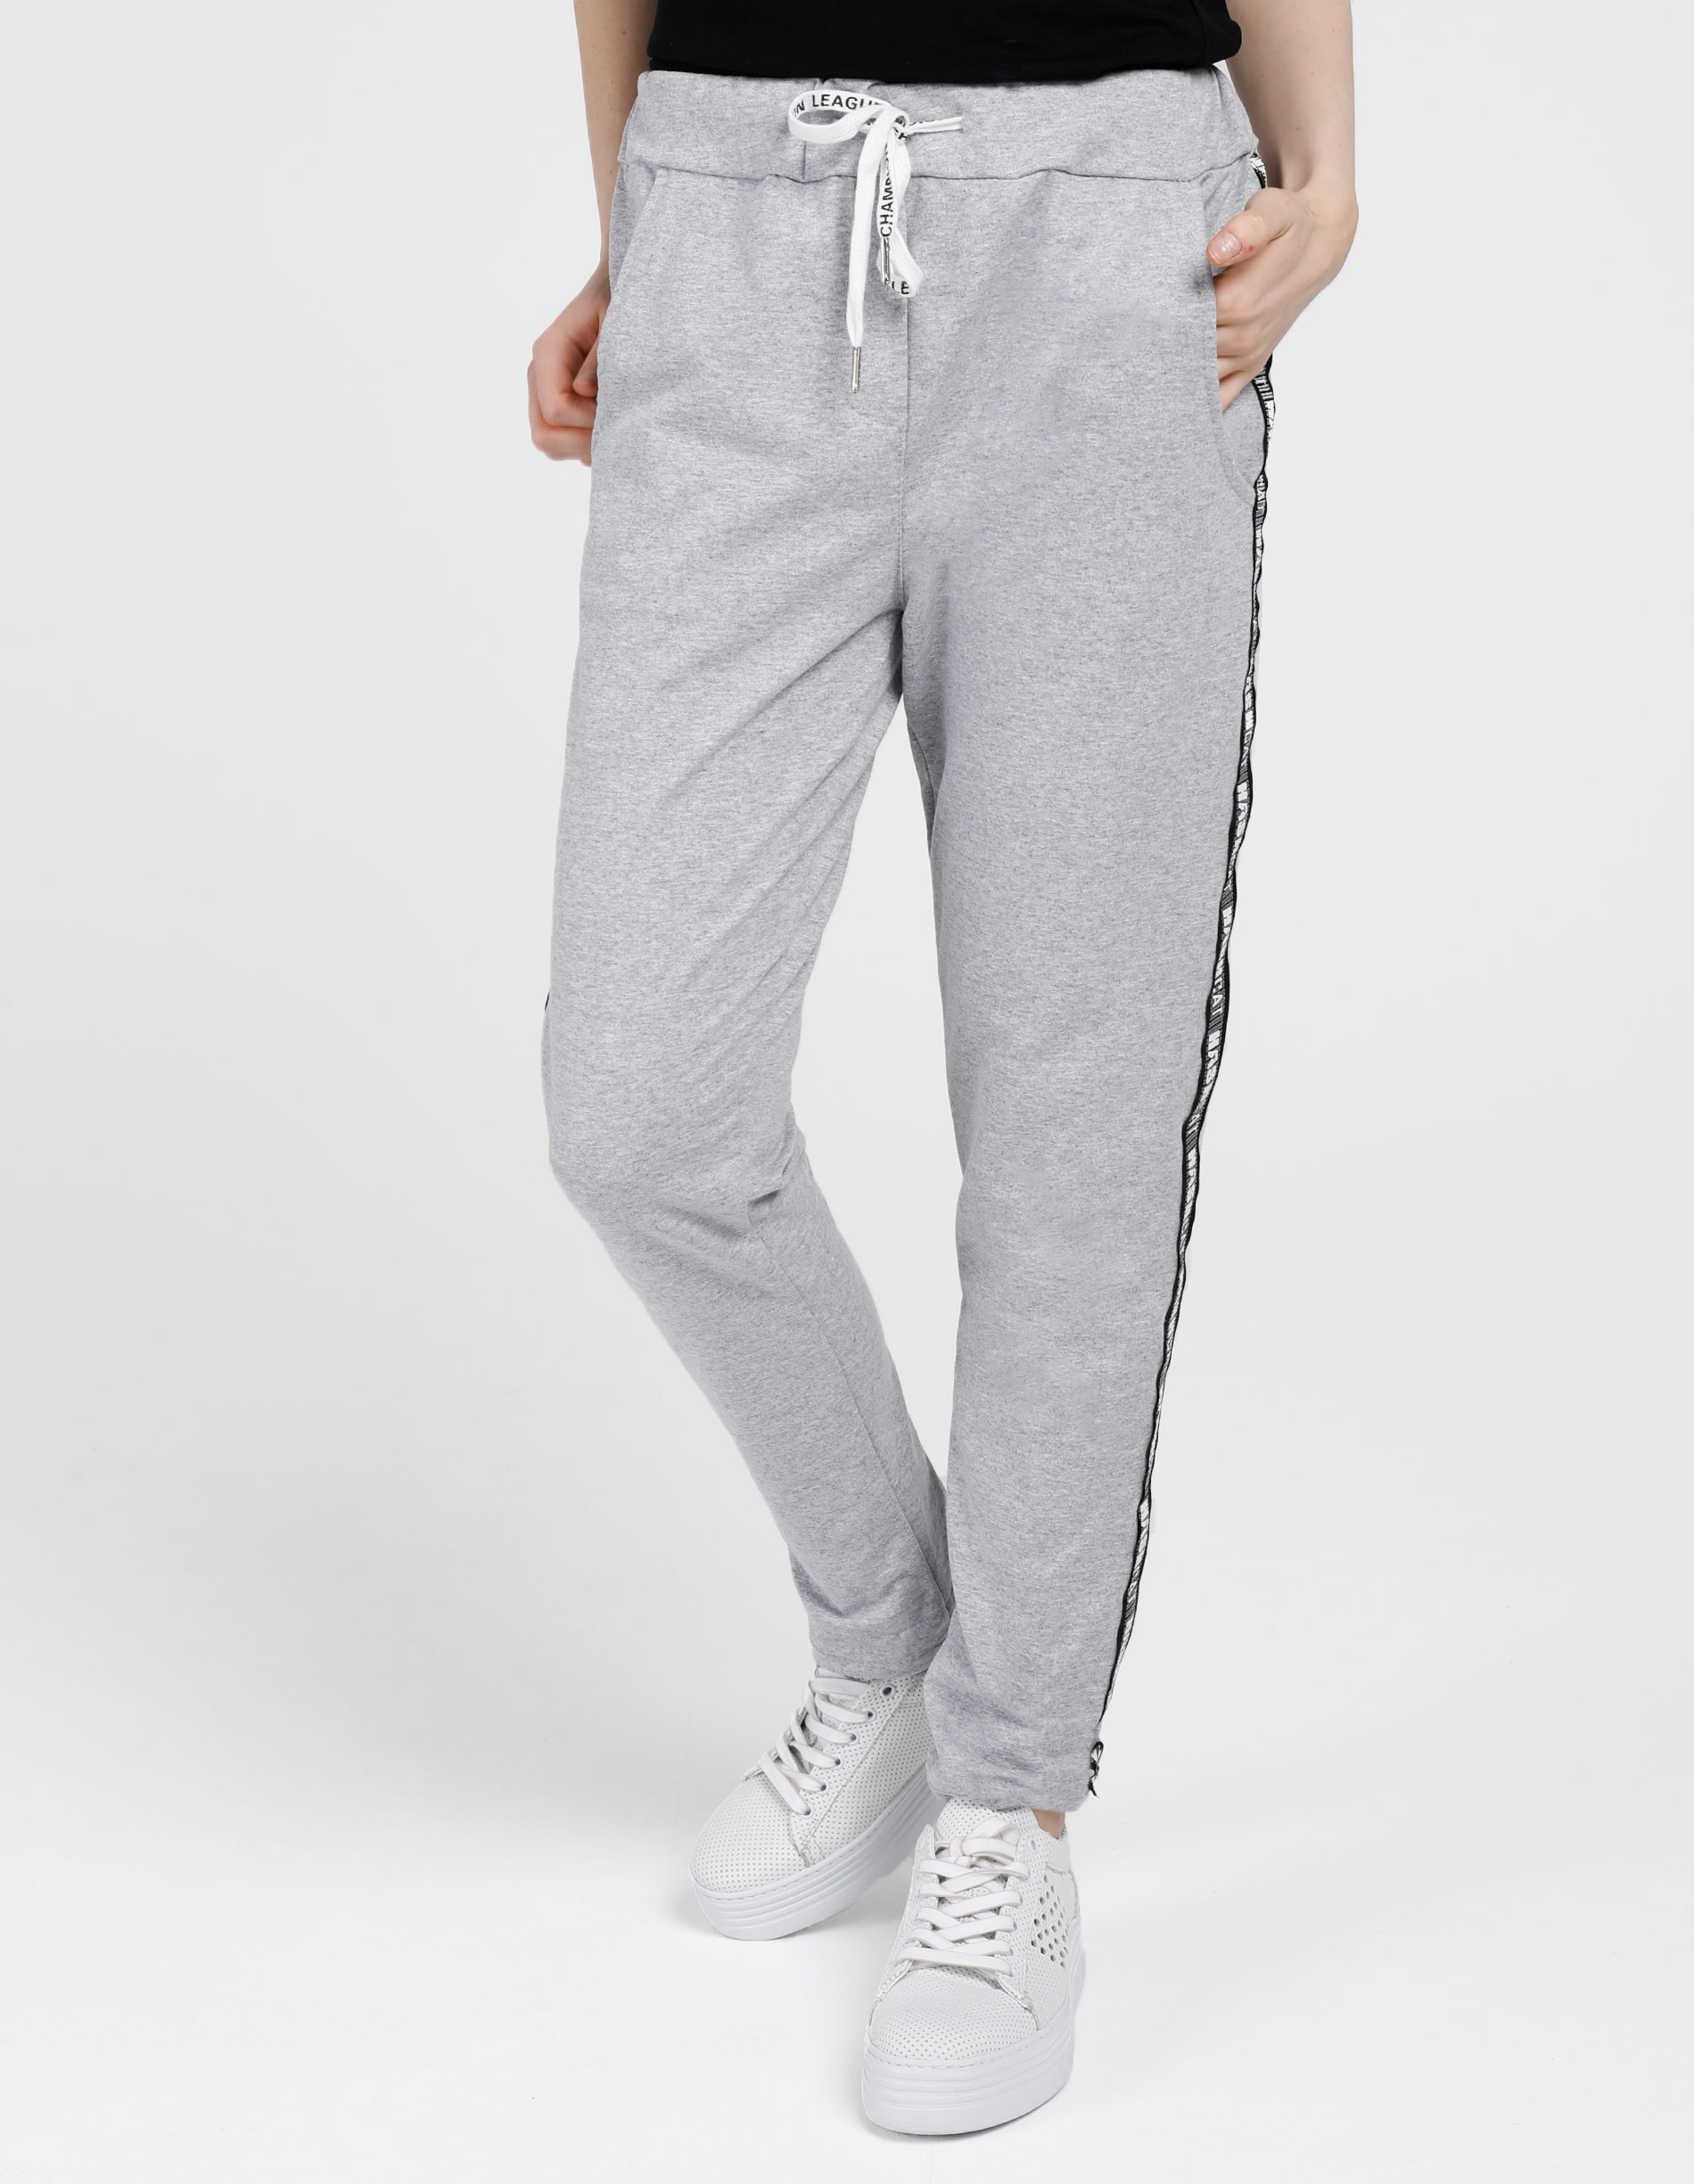 Spodnie - 63-1093 GRIGI - Unisono